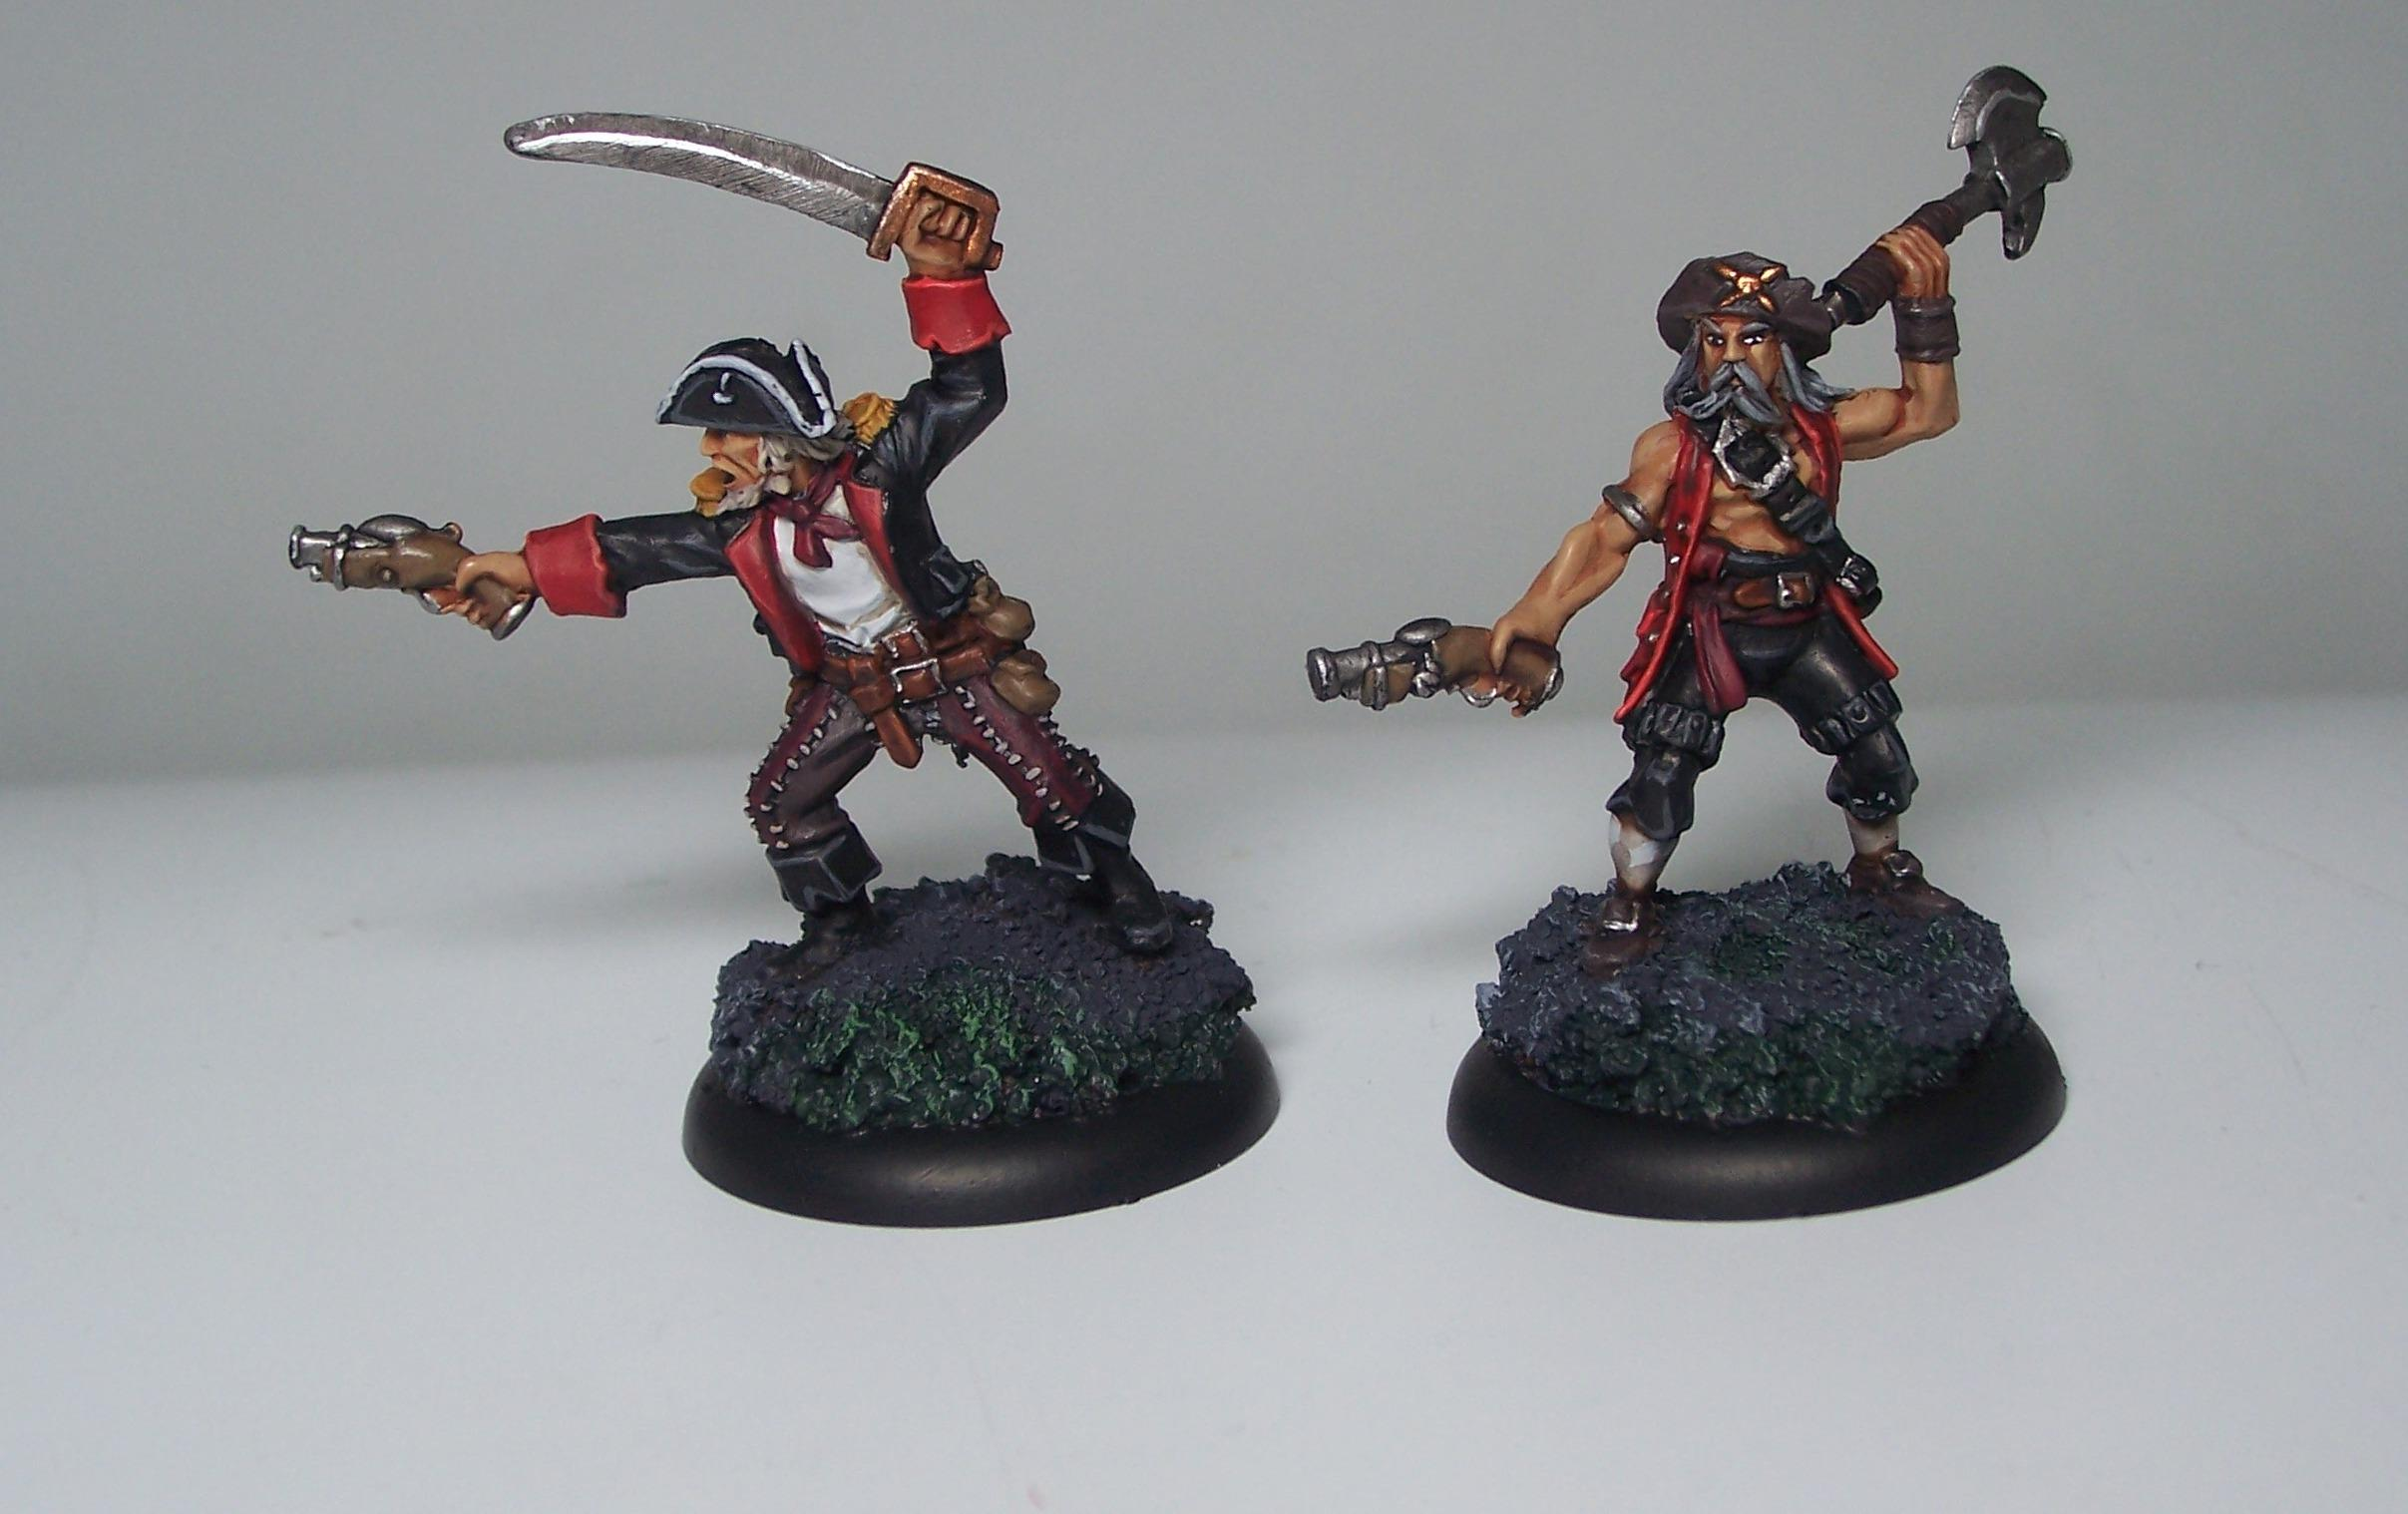 Pirates, Sea dog crew 3.1